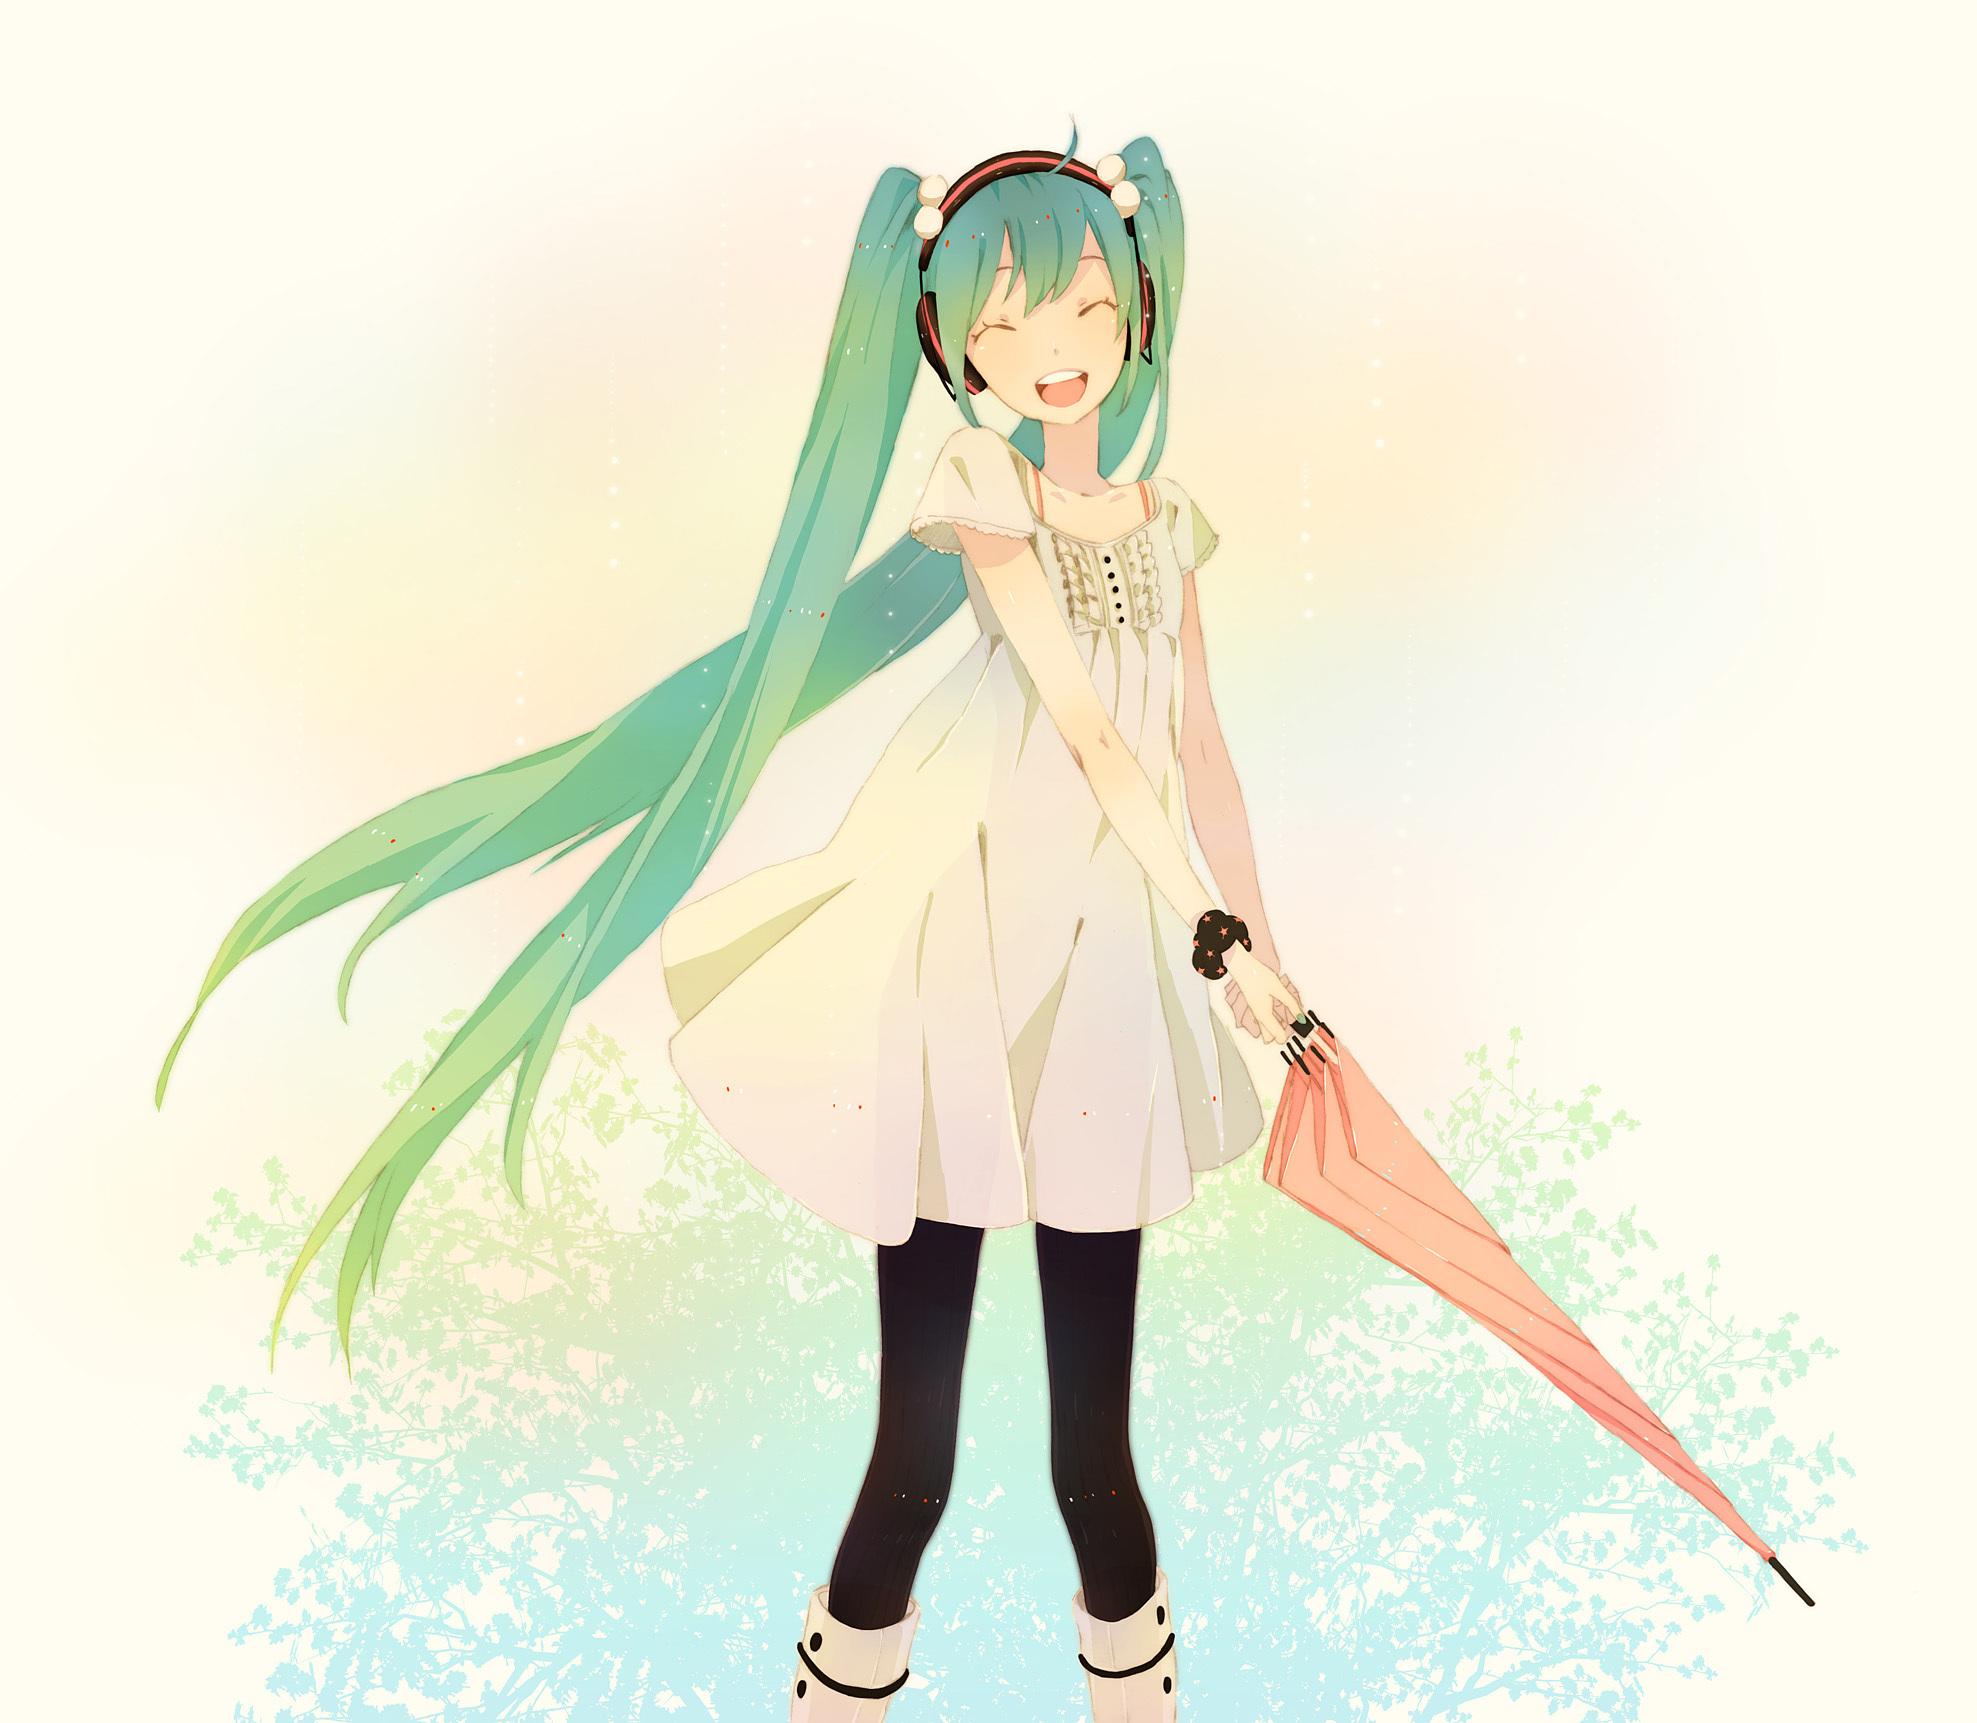 aqua_hair boots dress hatsune_miku headphones kuko:mi long_hair melt_(vocaloid) pantyhose twintails umbrella vocaloid white